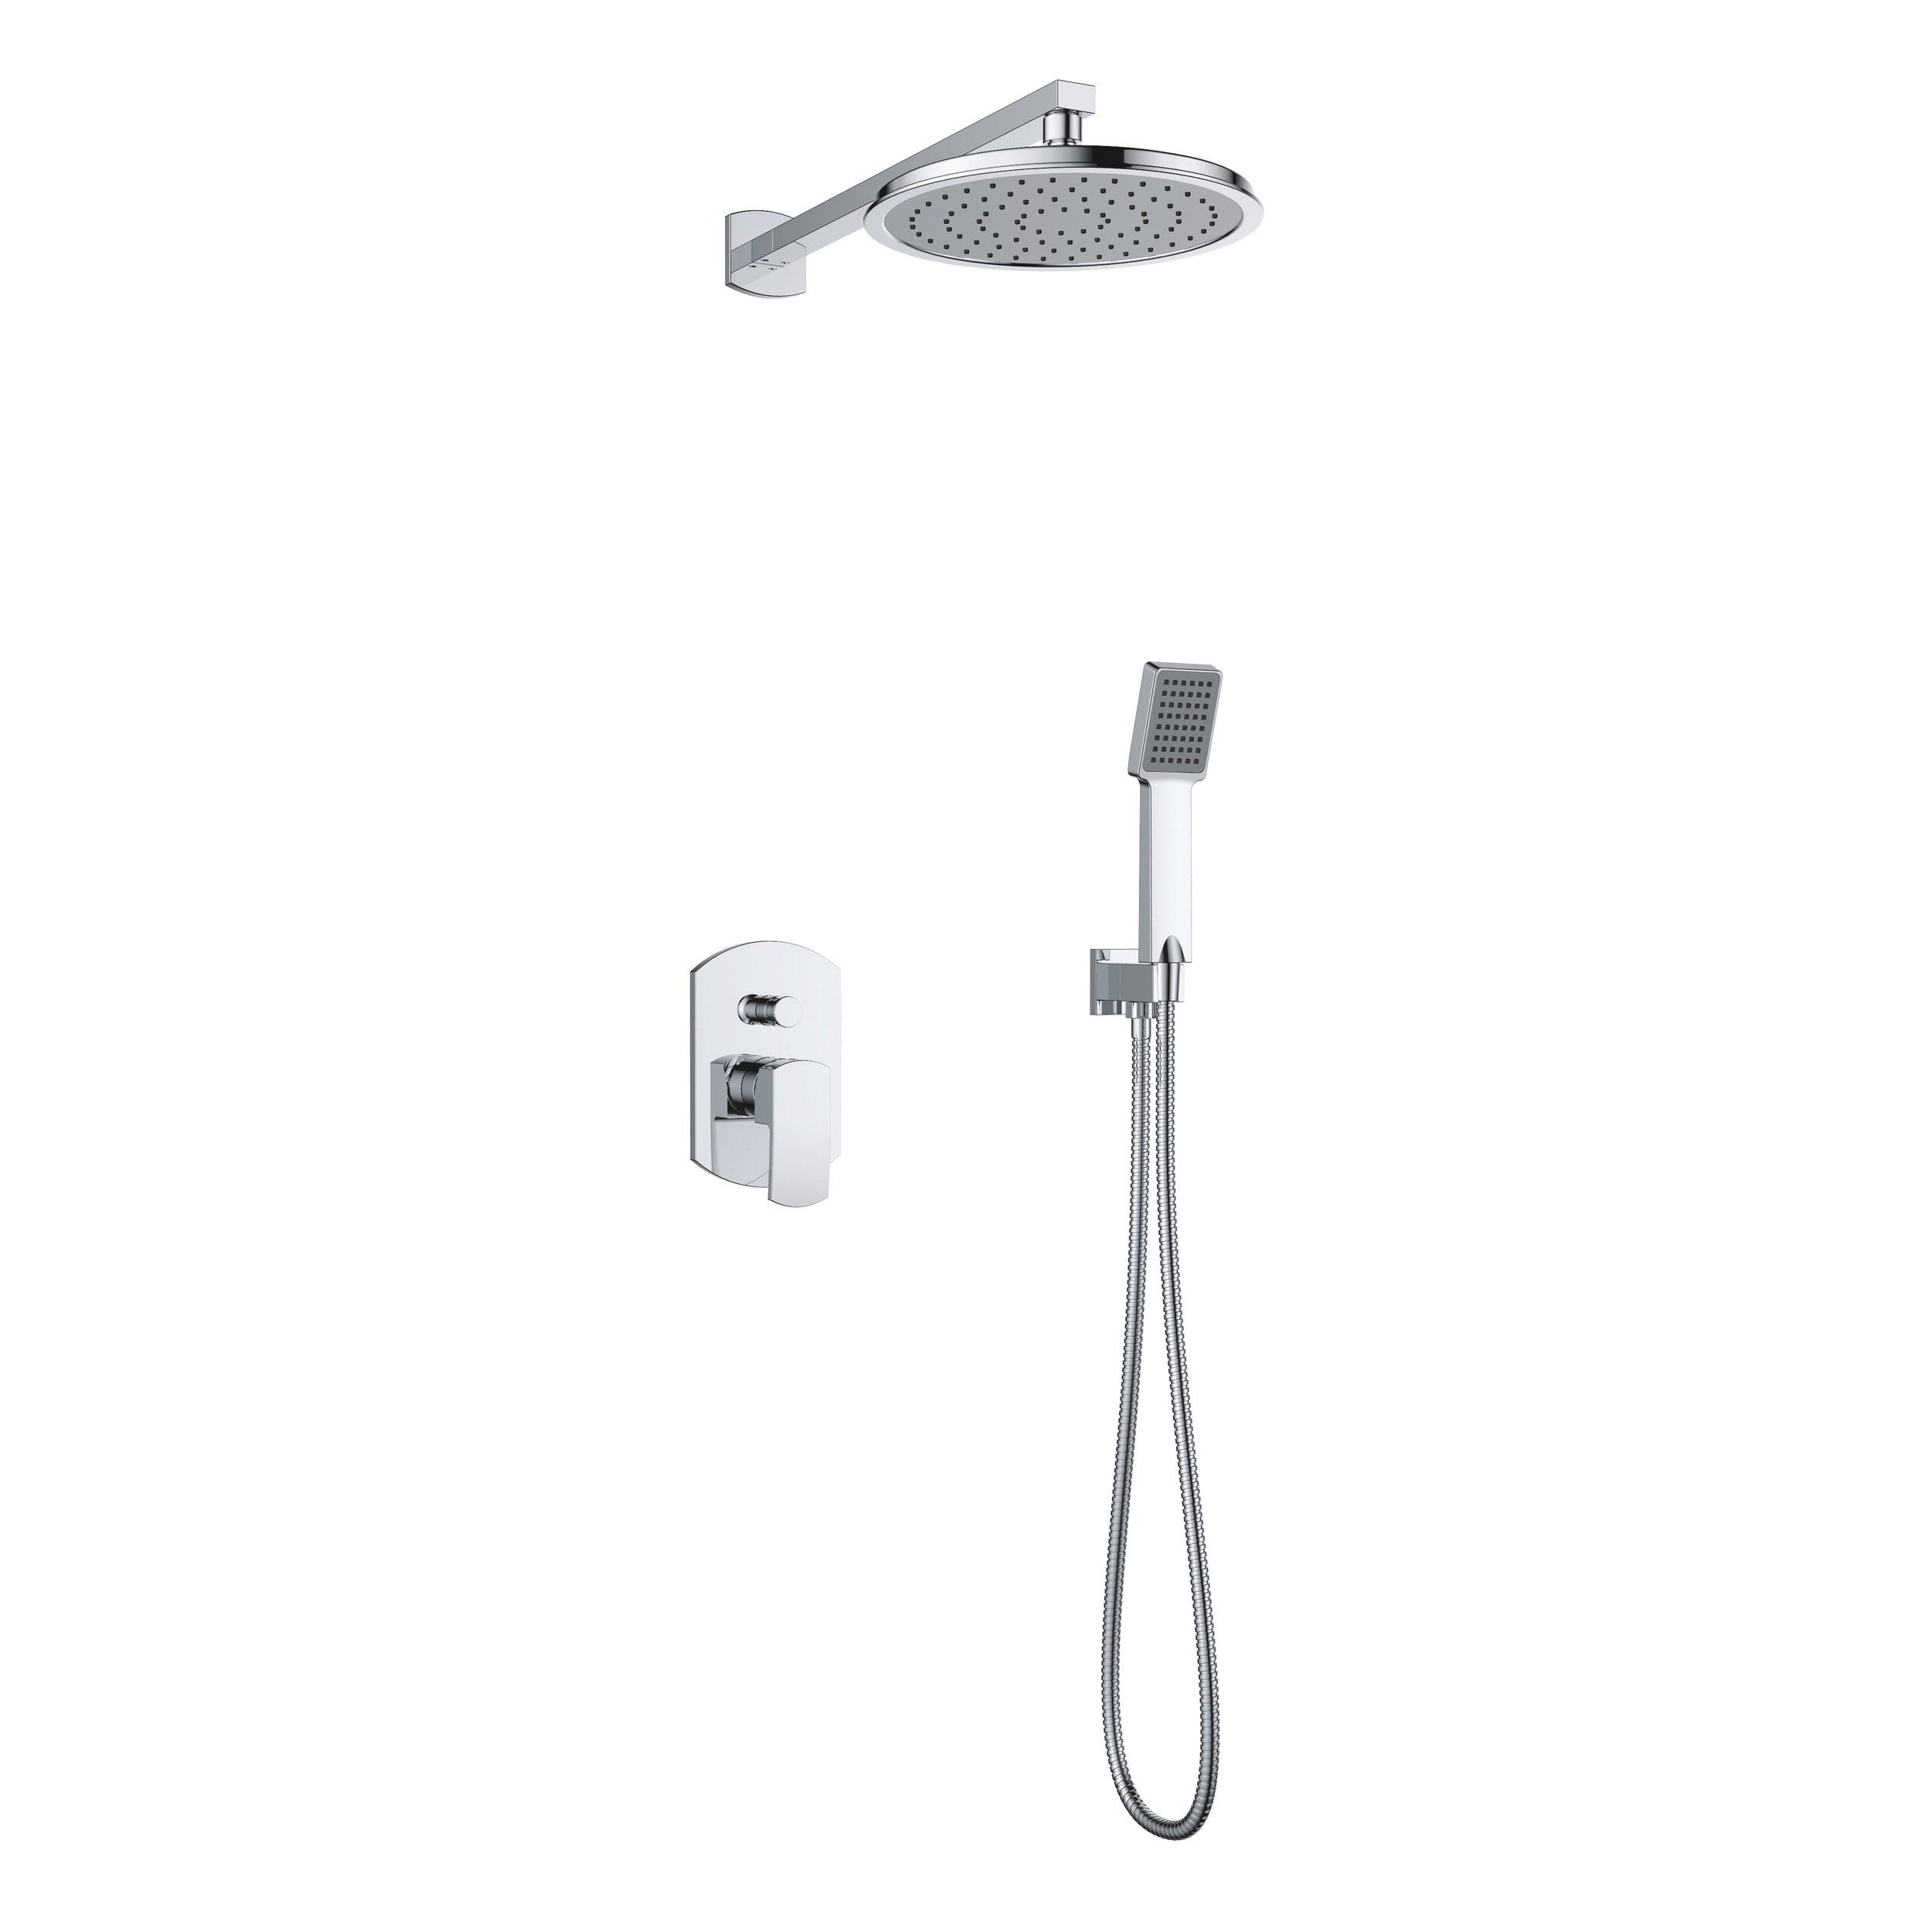 7357-101: Concealed shower valve with shower set and head shower